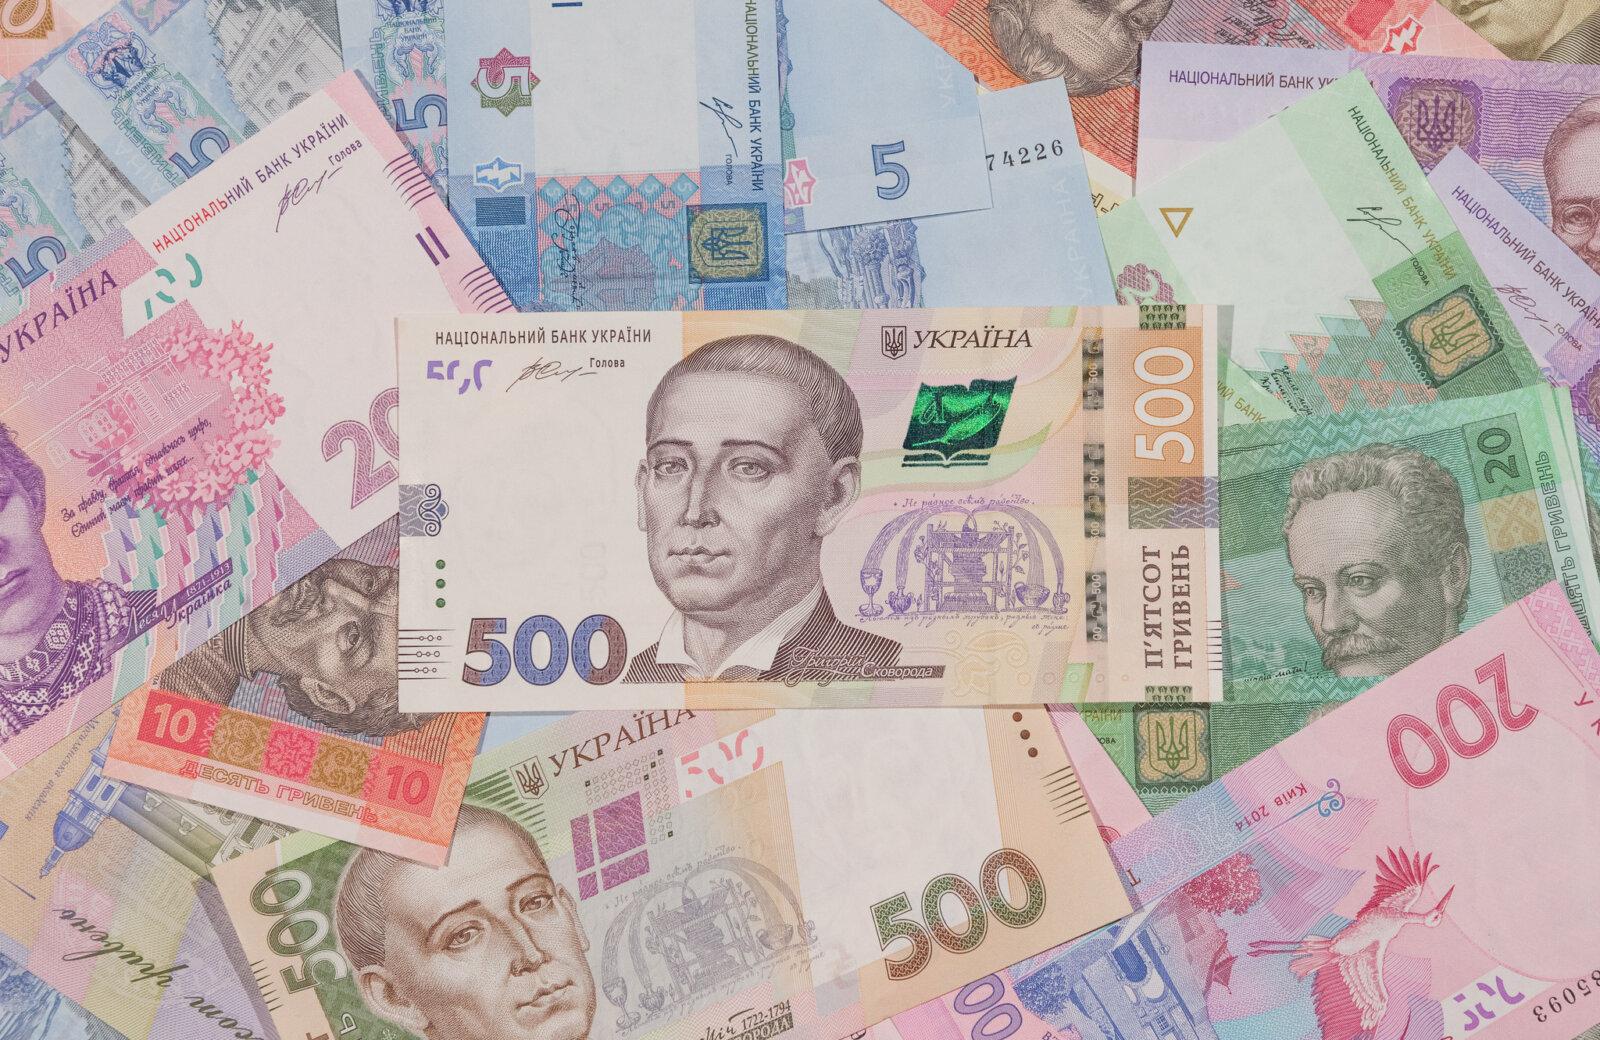 UNIAN: Average salary in Ukraine in US dollars in March 2019